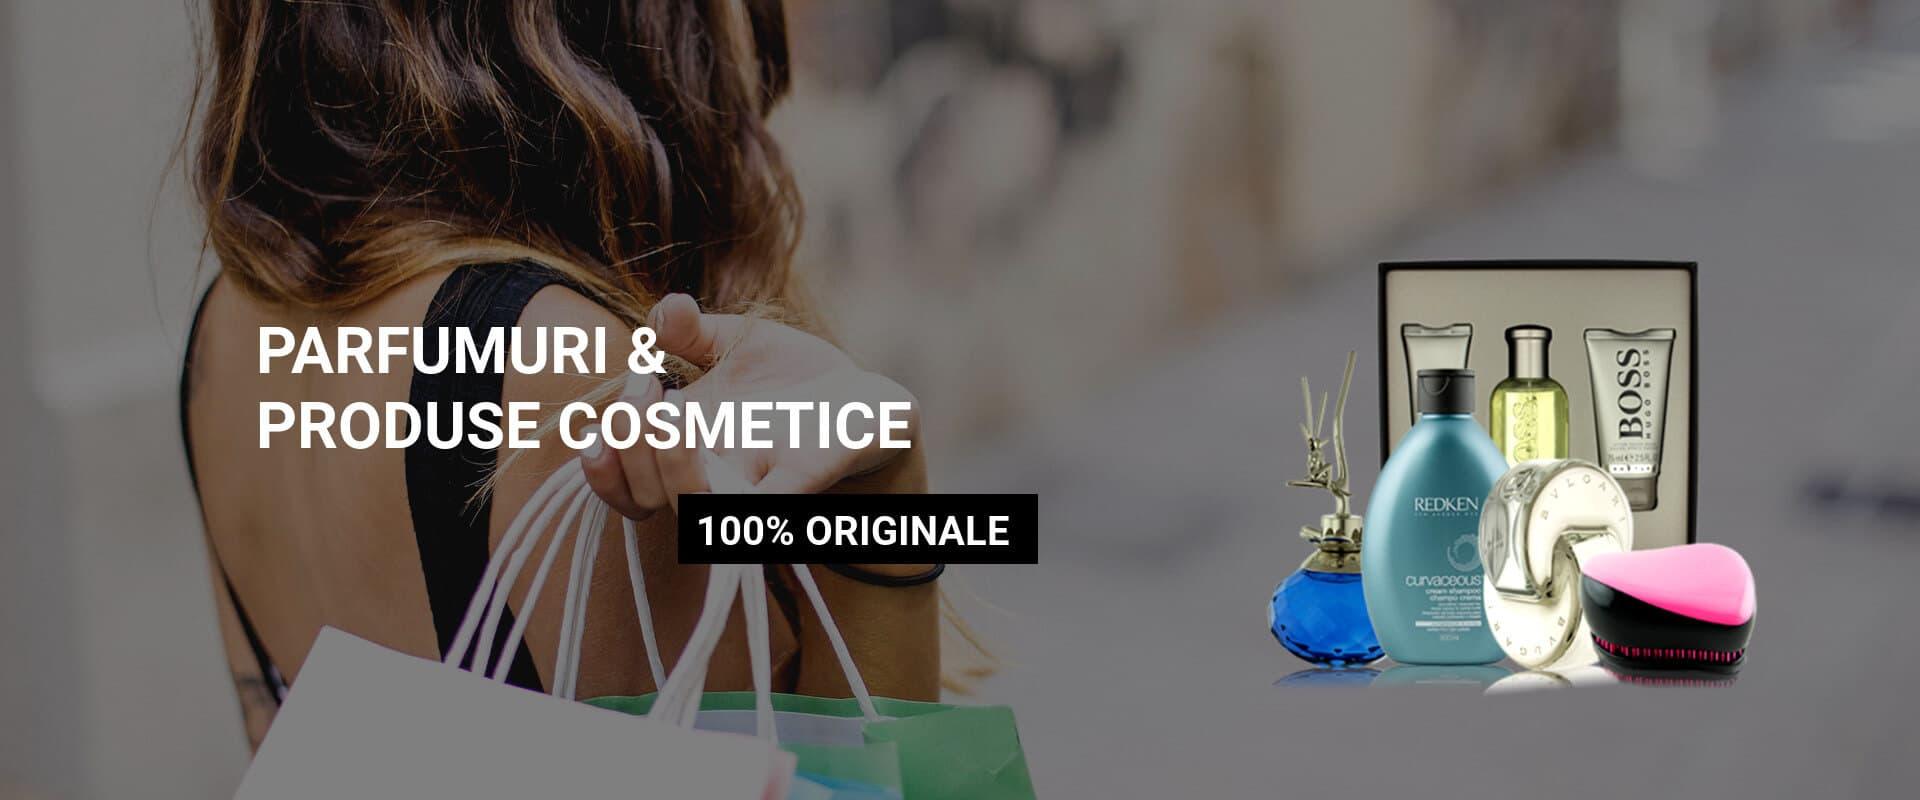 Parfumuri si cosmetice 100% Originale